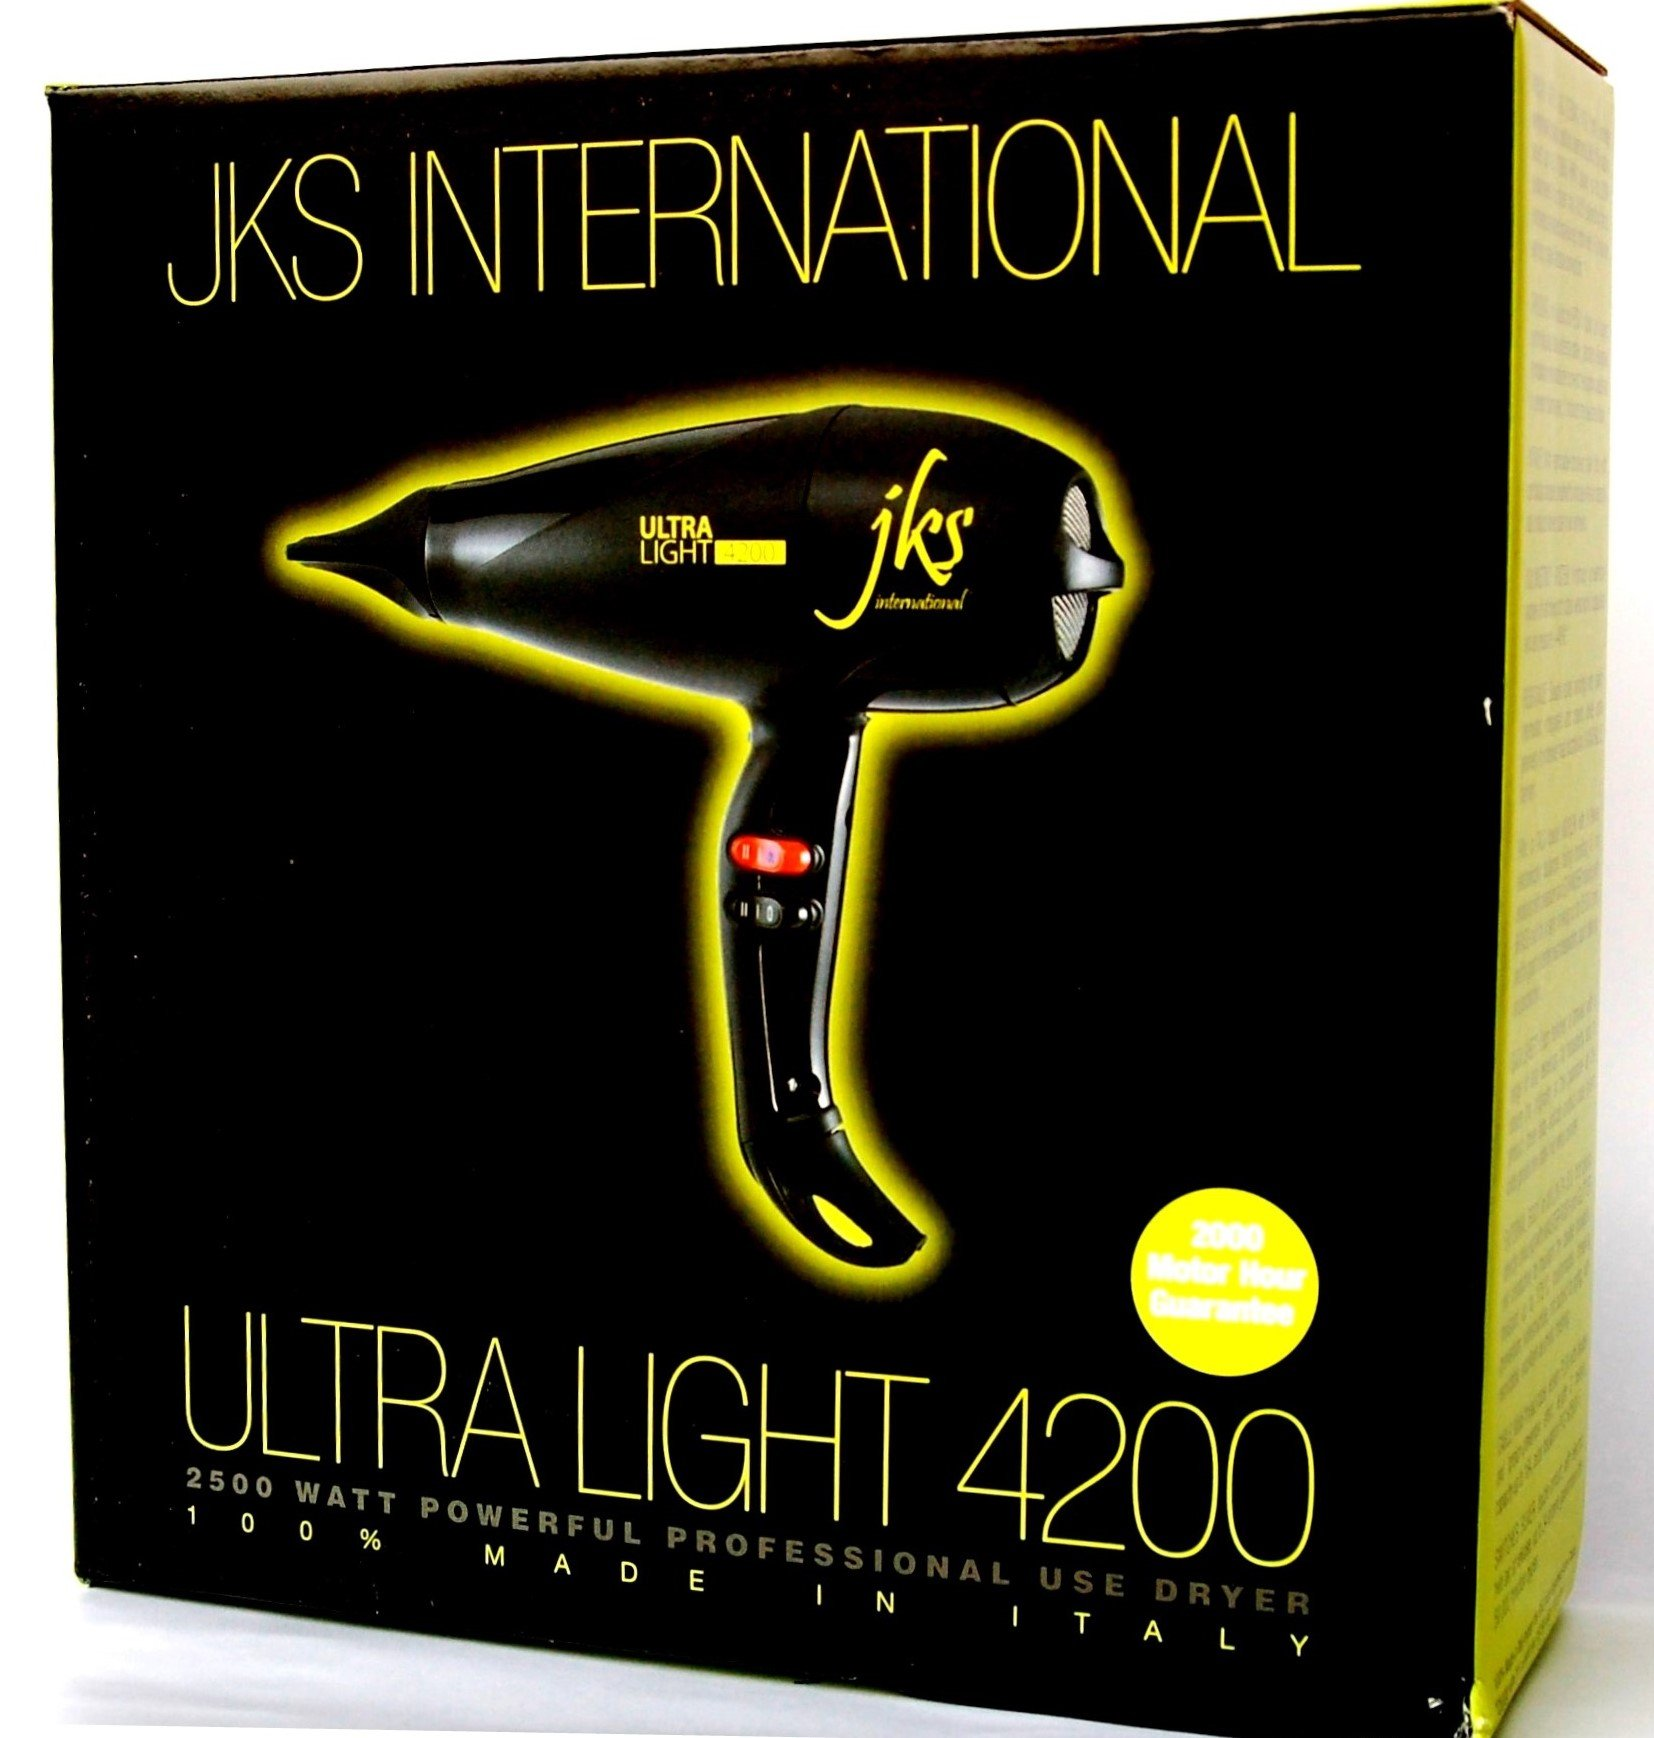 JKS Italian Ultra Light 4200 Powerful Blow Dryer, Award Winner, professional stylist #1 choice by jks International